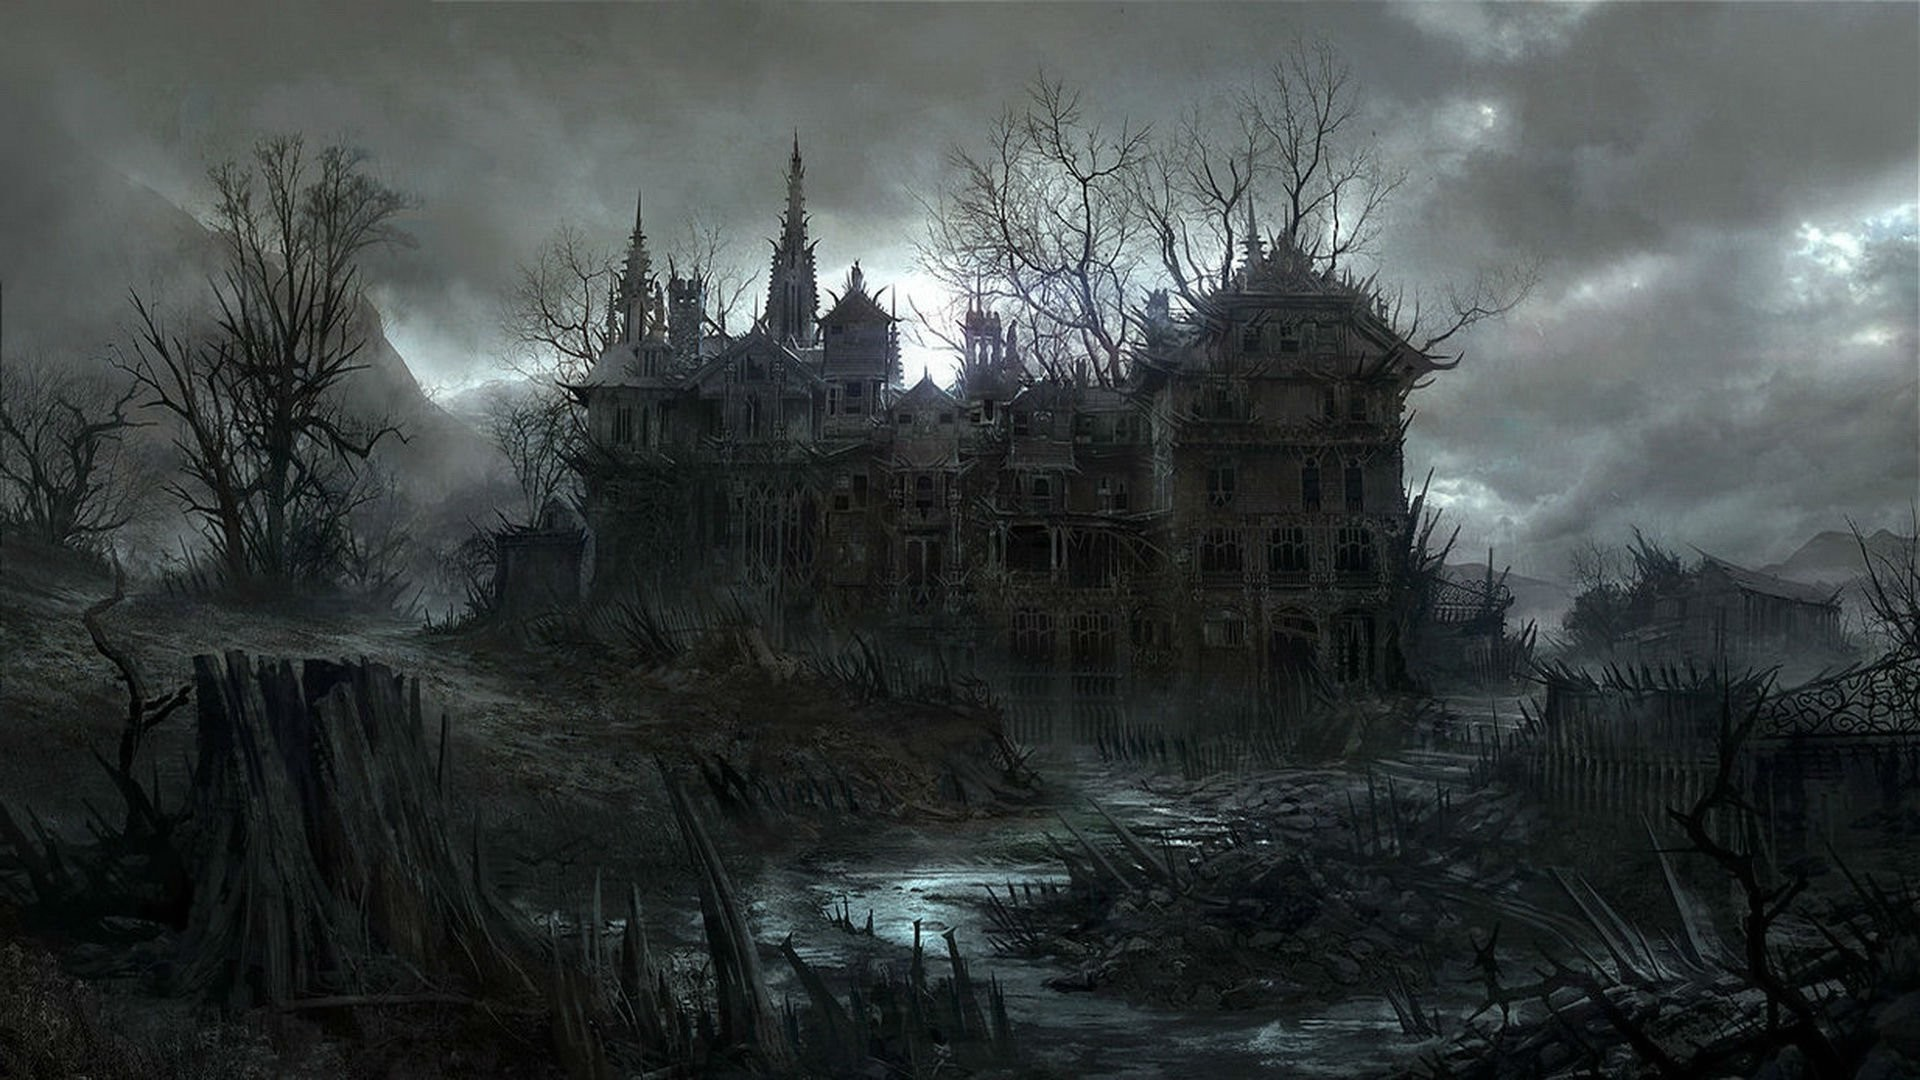 HALLOWEEN dark haunted house spooky wallpaper background